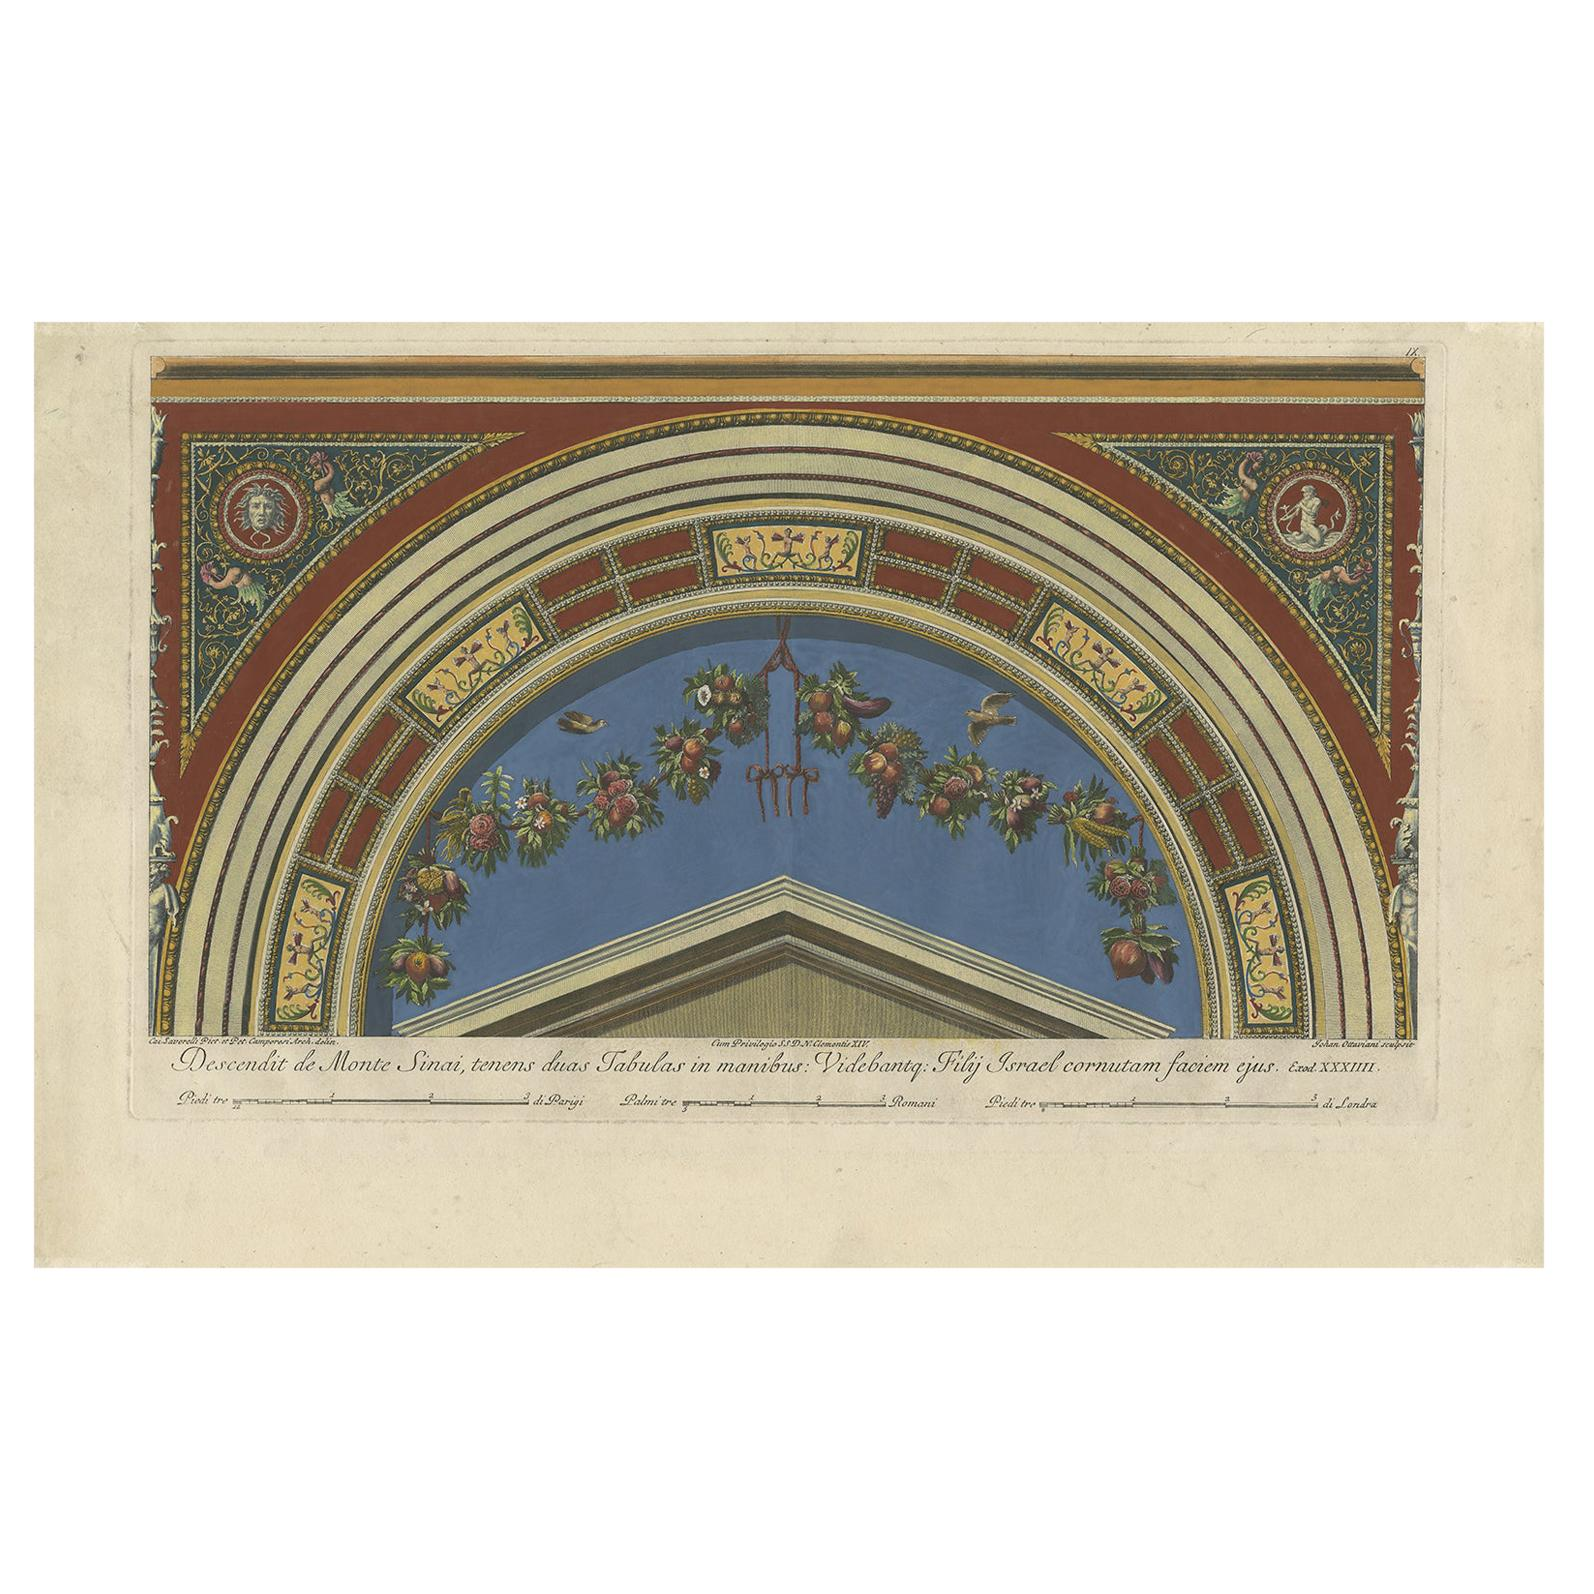 Antique Print of a Fresco in the Vatican by Ottaviani, circa 1775